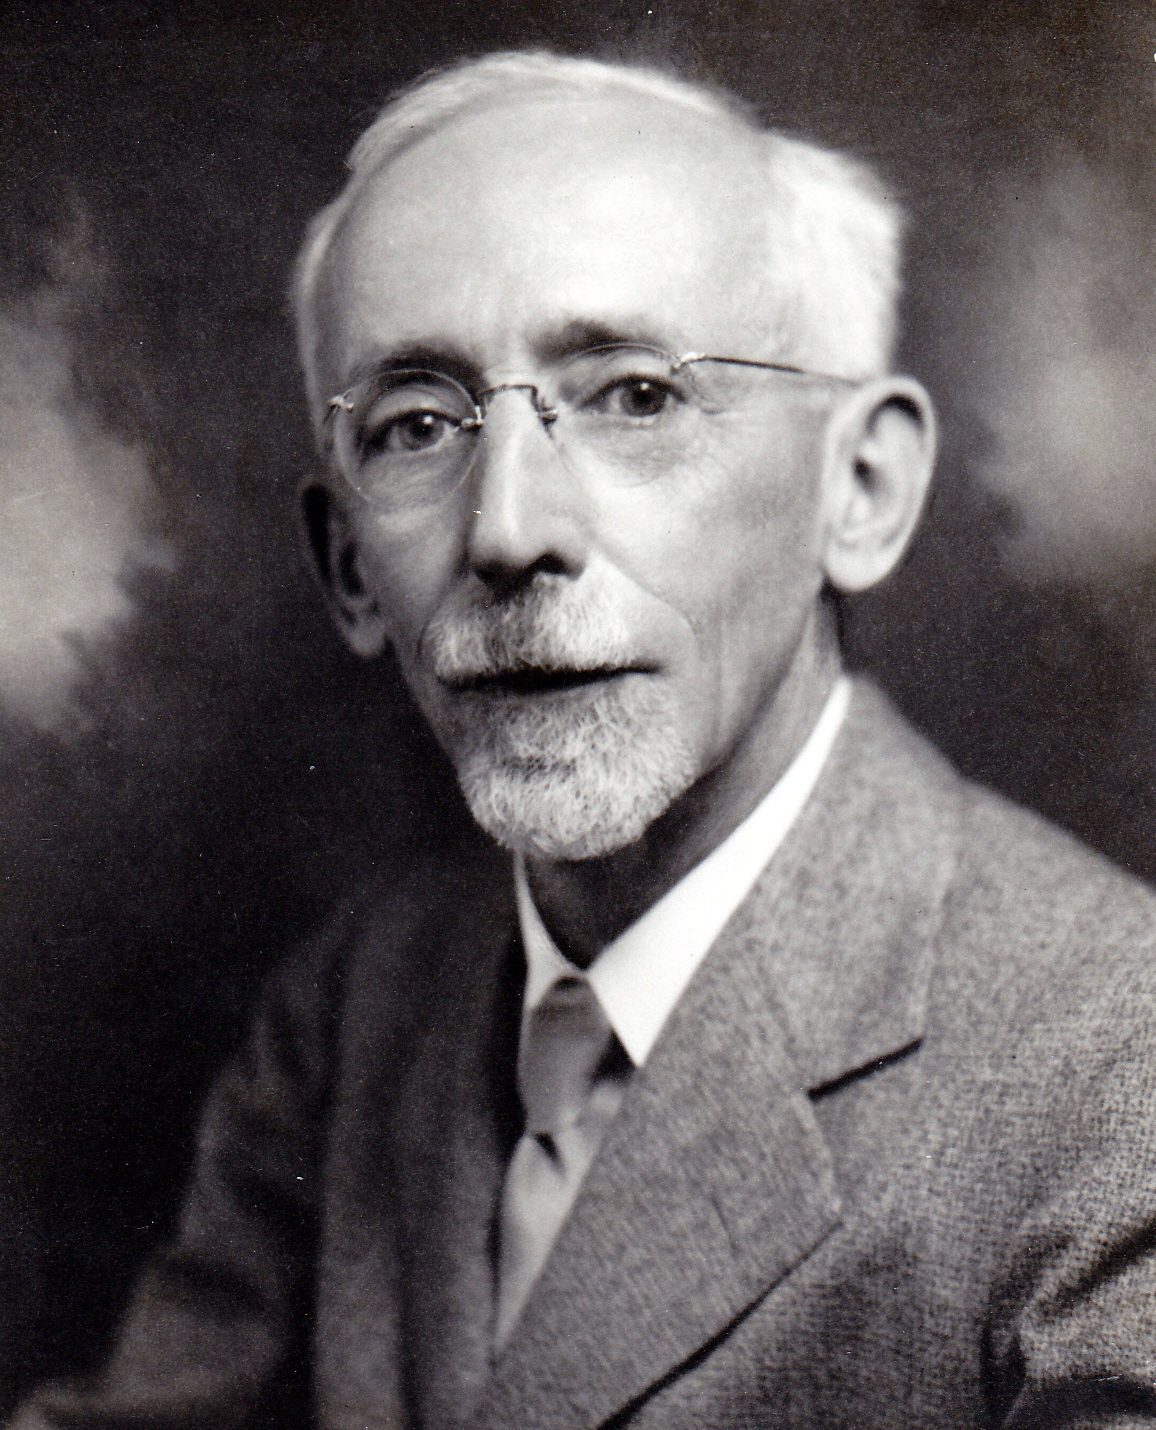 Image of Frank Eugene Lutz from Wikidata